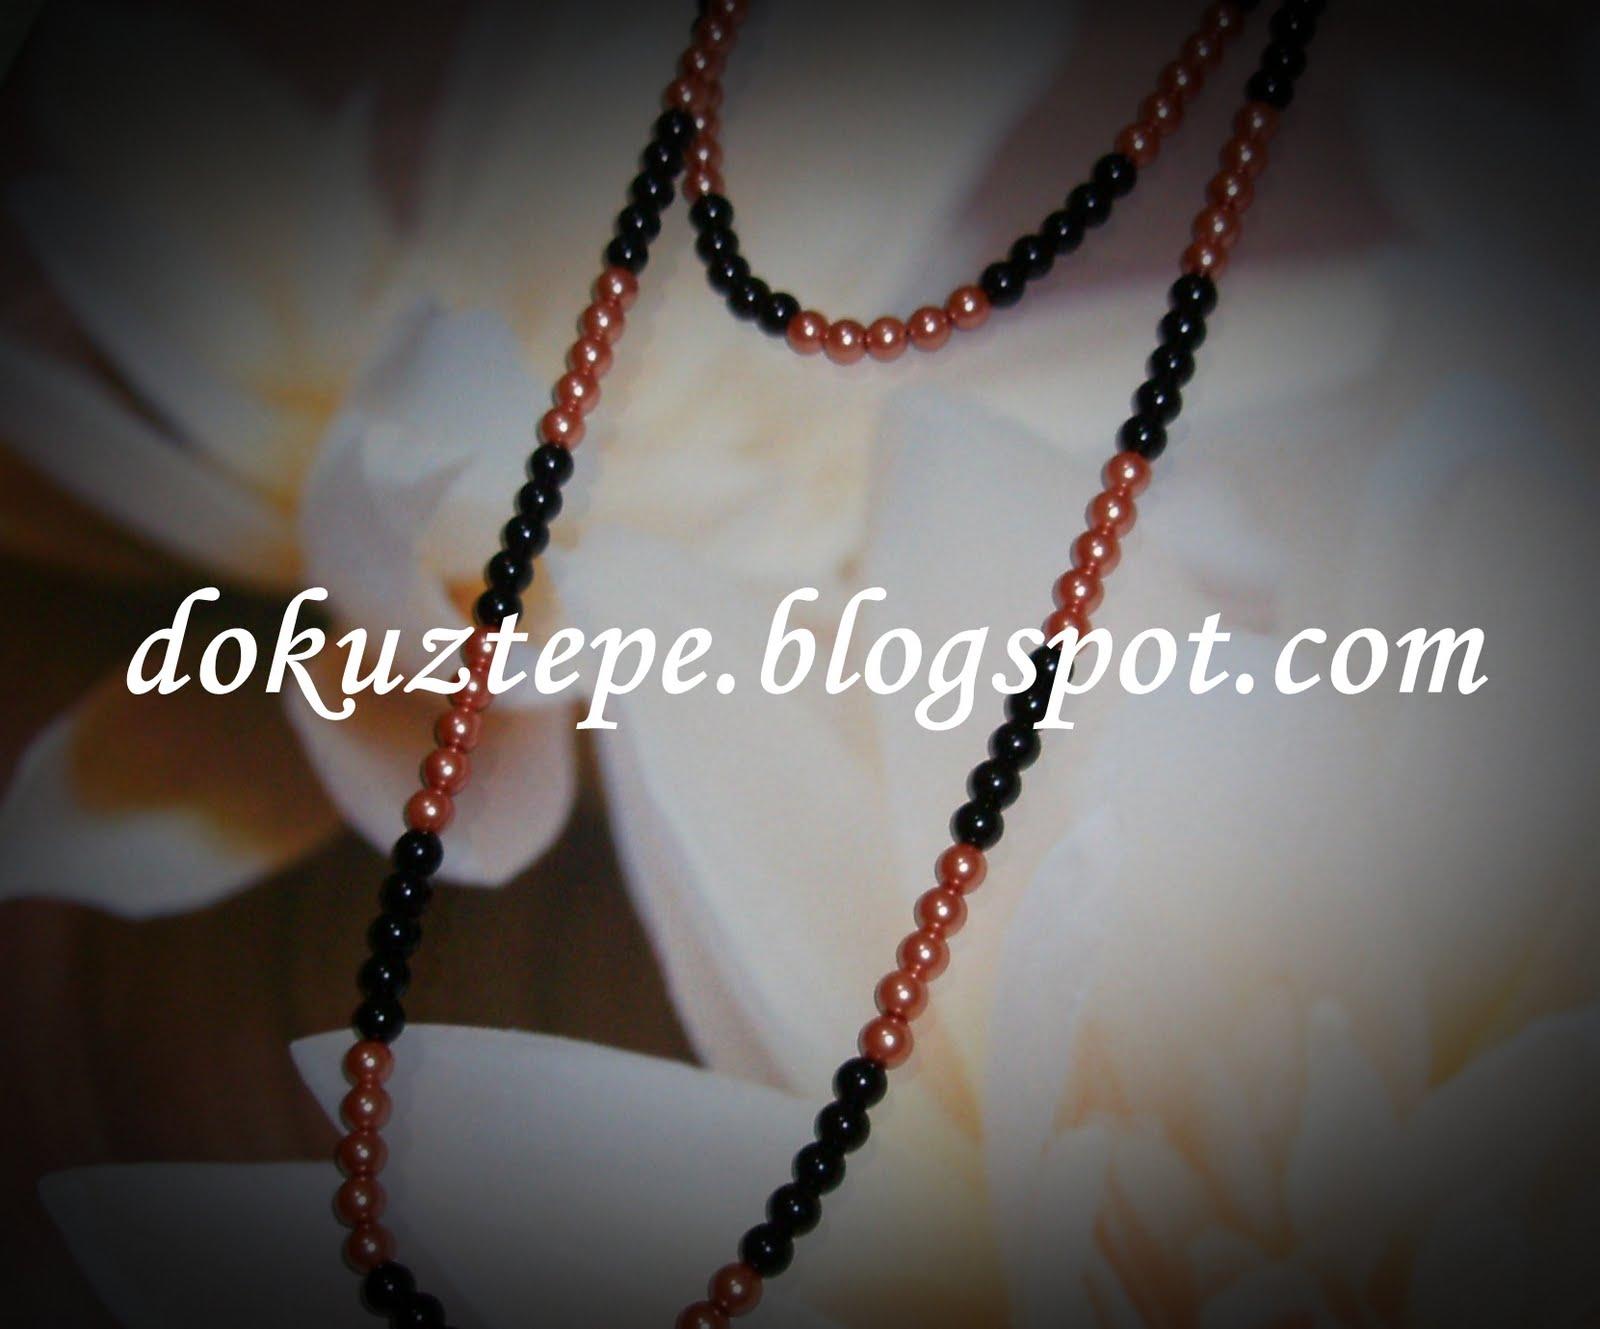 http://3.bp.blogspot.com/-WH2nx73_pYU/TblLBnTs9hI/AAAAAAAABGw/WeIPlQeQLbE/s1600/SANY5018.JPG